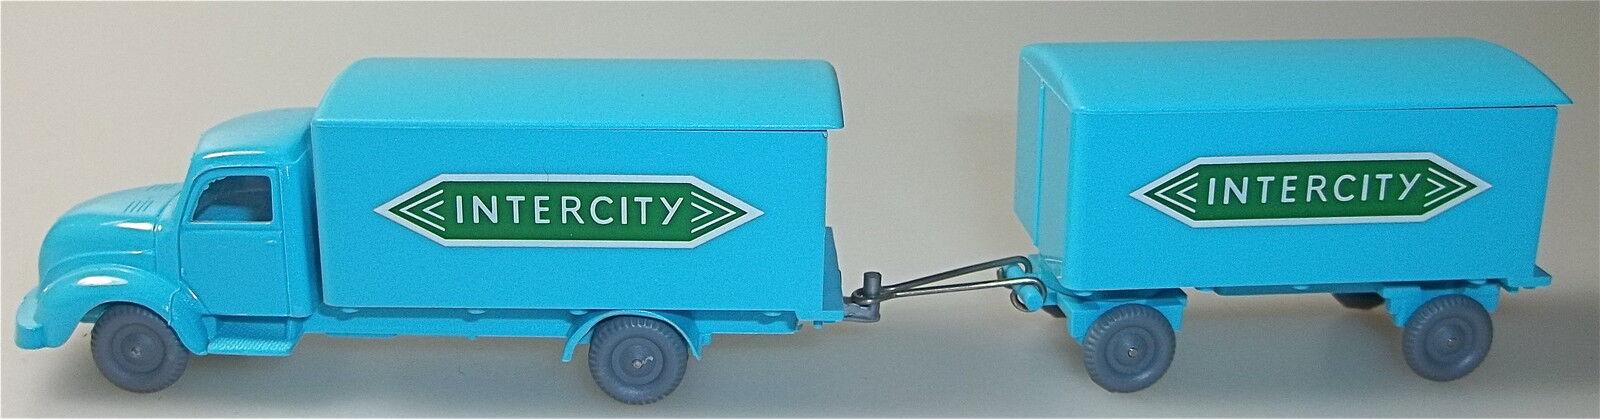 Intercity Magirus rundhauber hängerzug azul claro verde IMU h0 1 87  55  Å